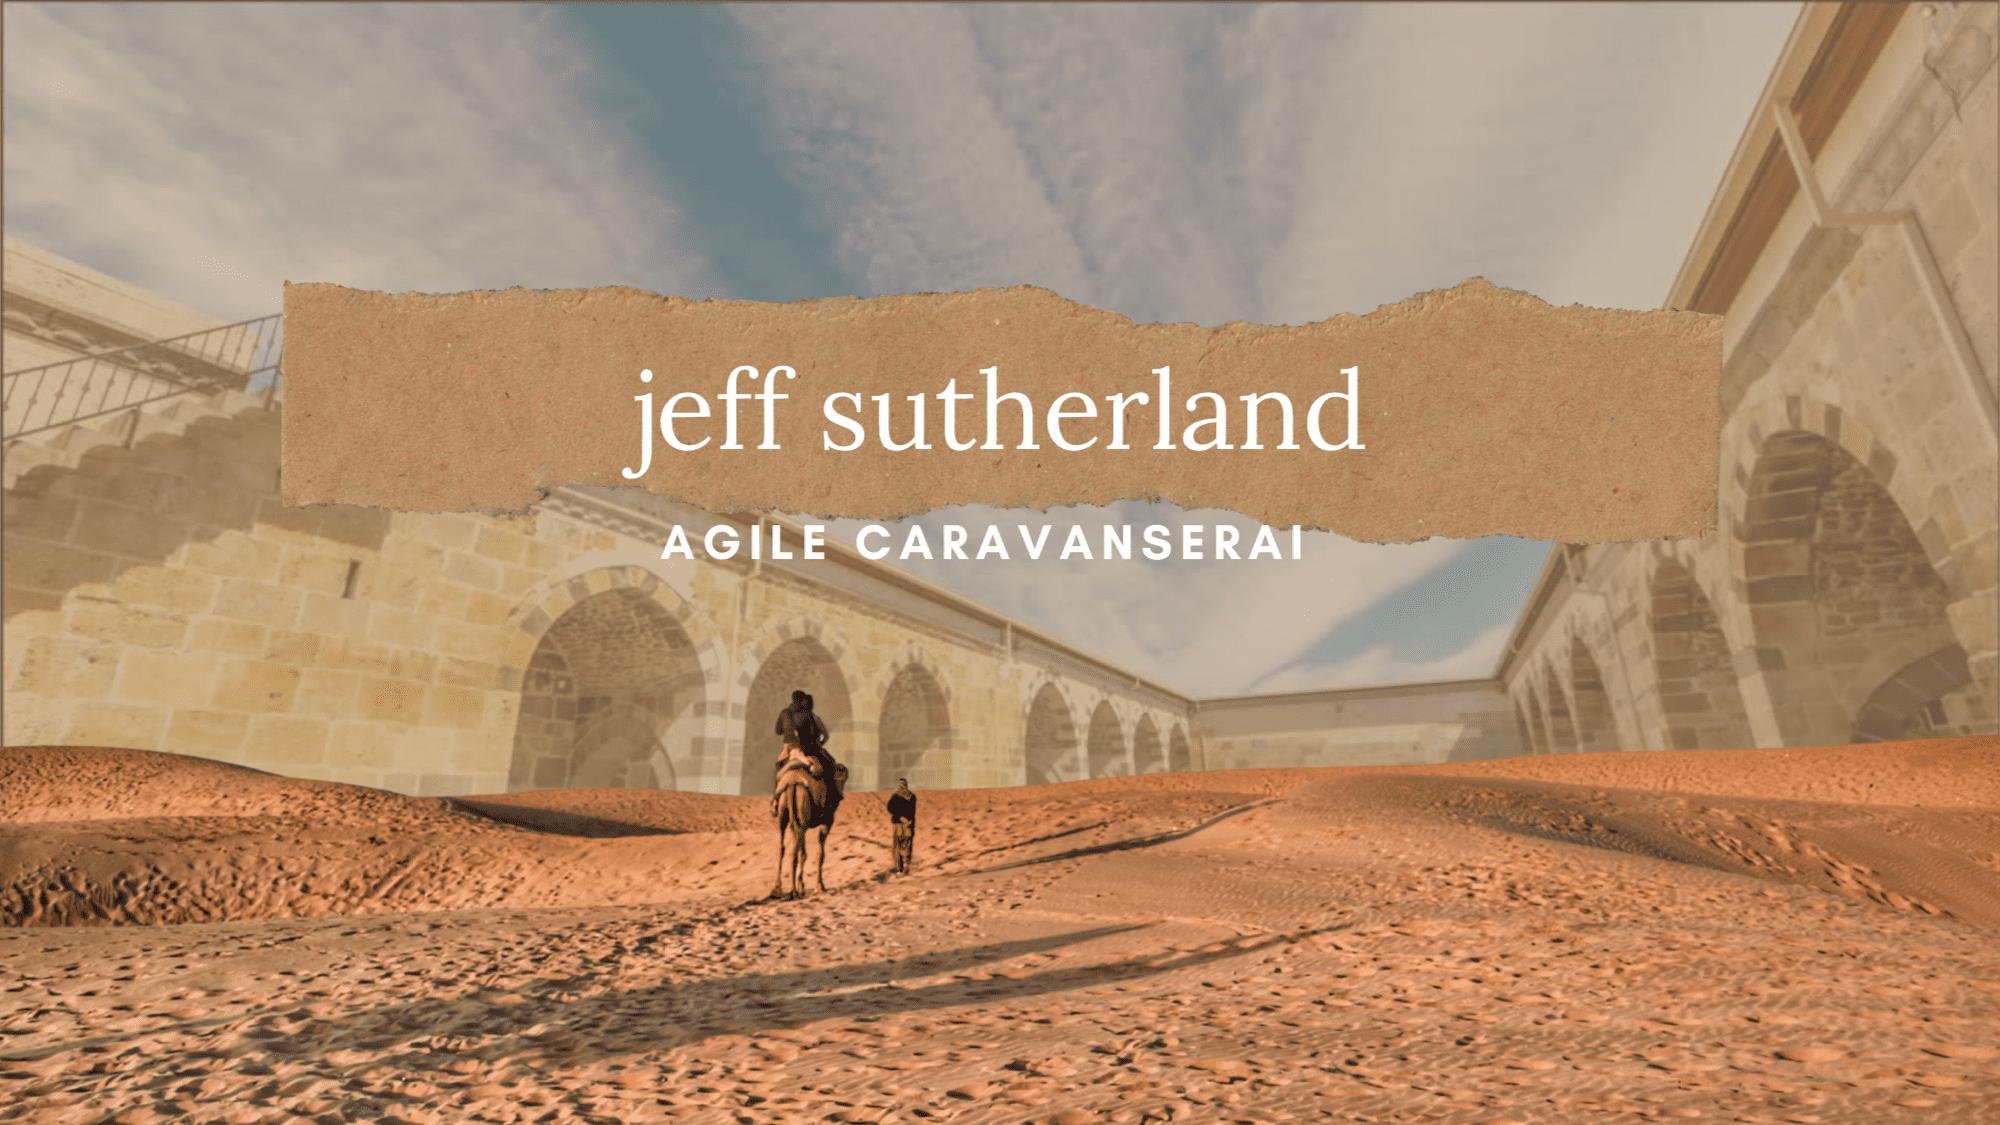 Agile Caravanserai Jeff Sutherland